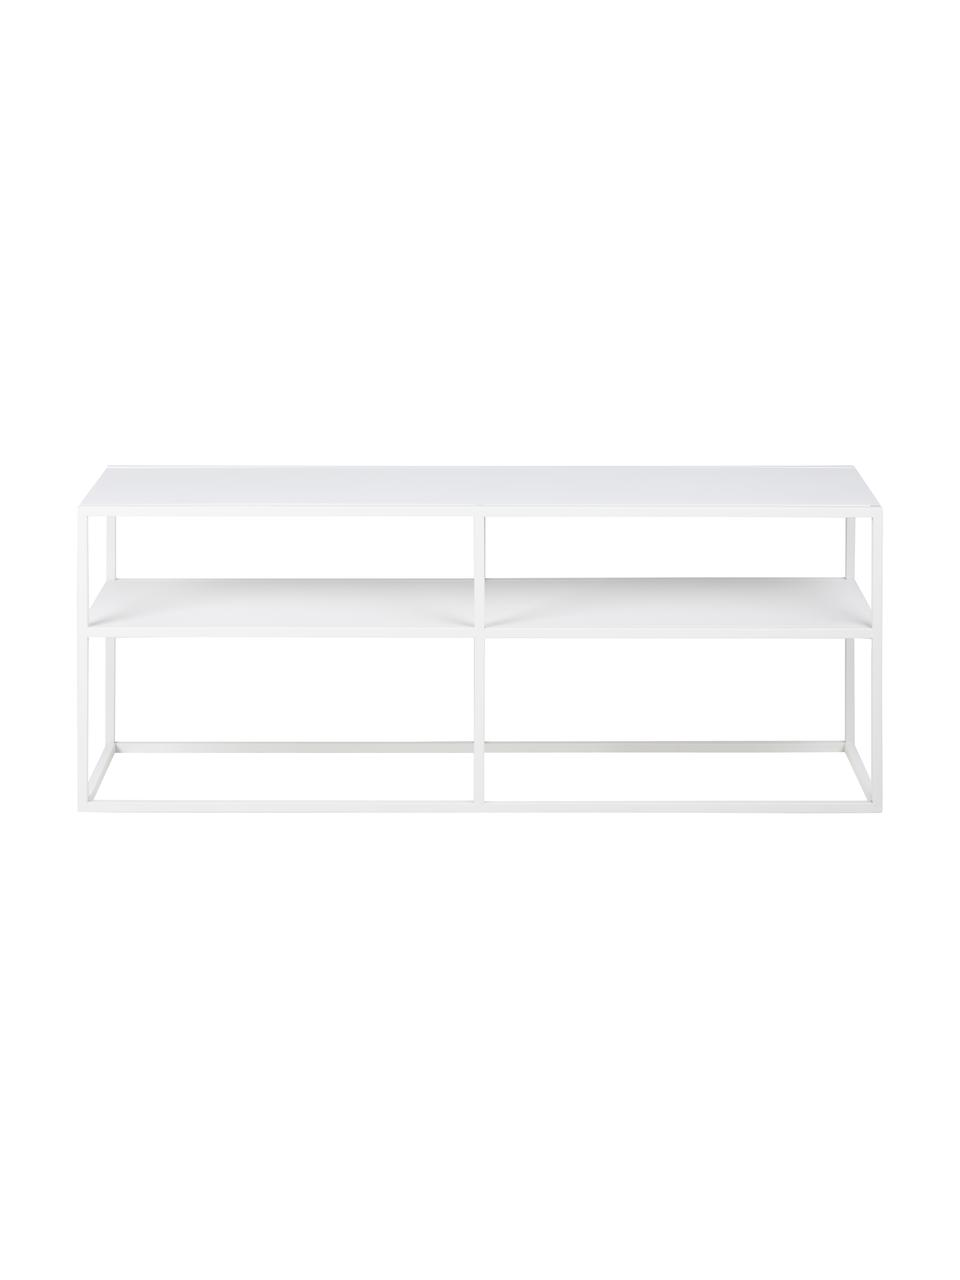 Metall-Lowboard Neptun in Weiß, Metall, pulverbeschichtet, Weiß, 120 x 46 cm